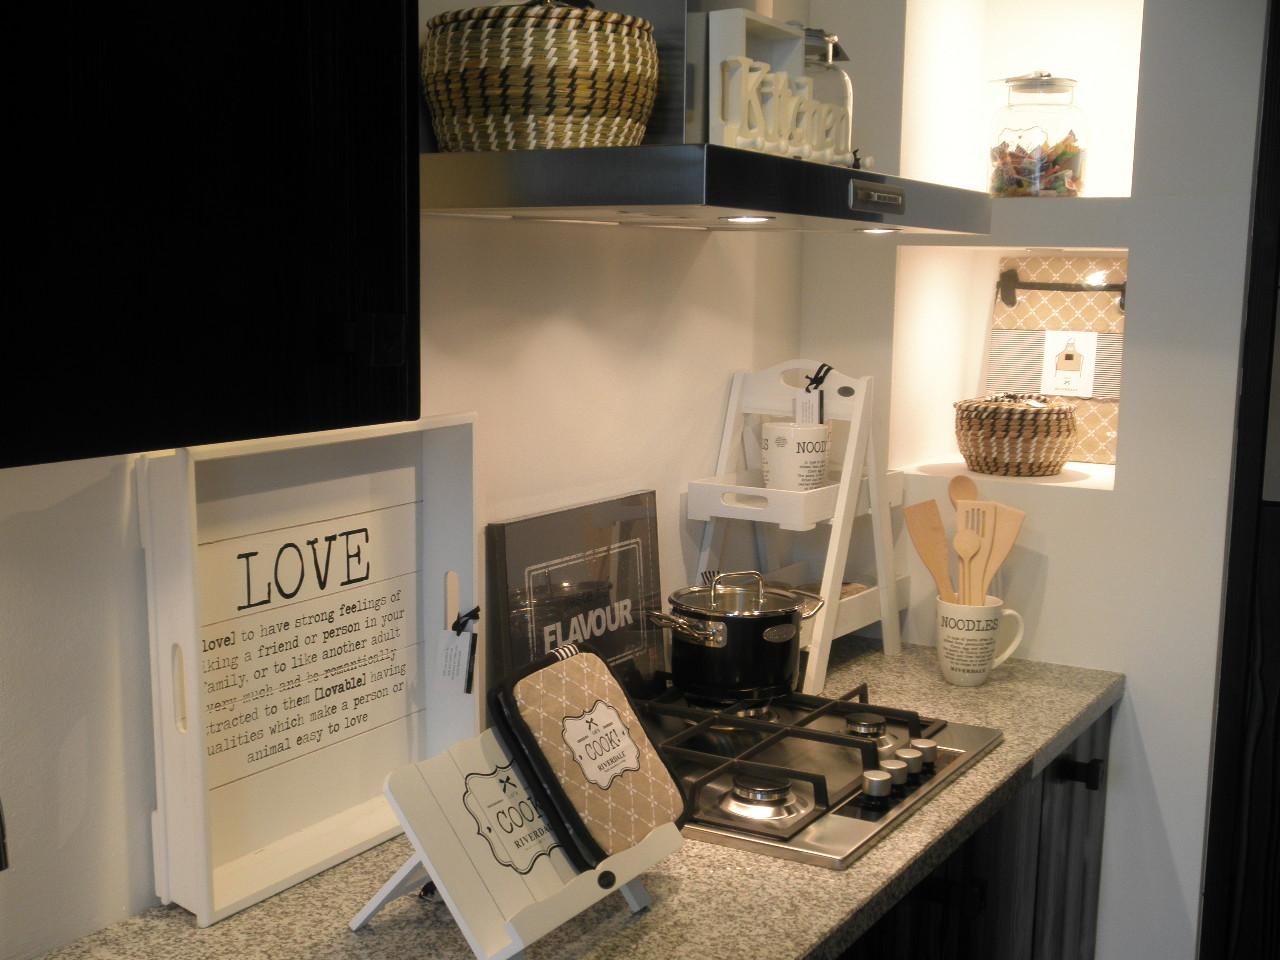 Hema Keuken Accessoires : Riverdale keukens stylish, sfeervol & stoer Nieuws